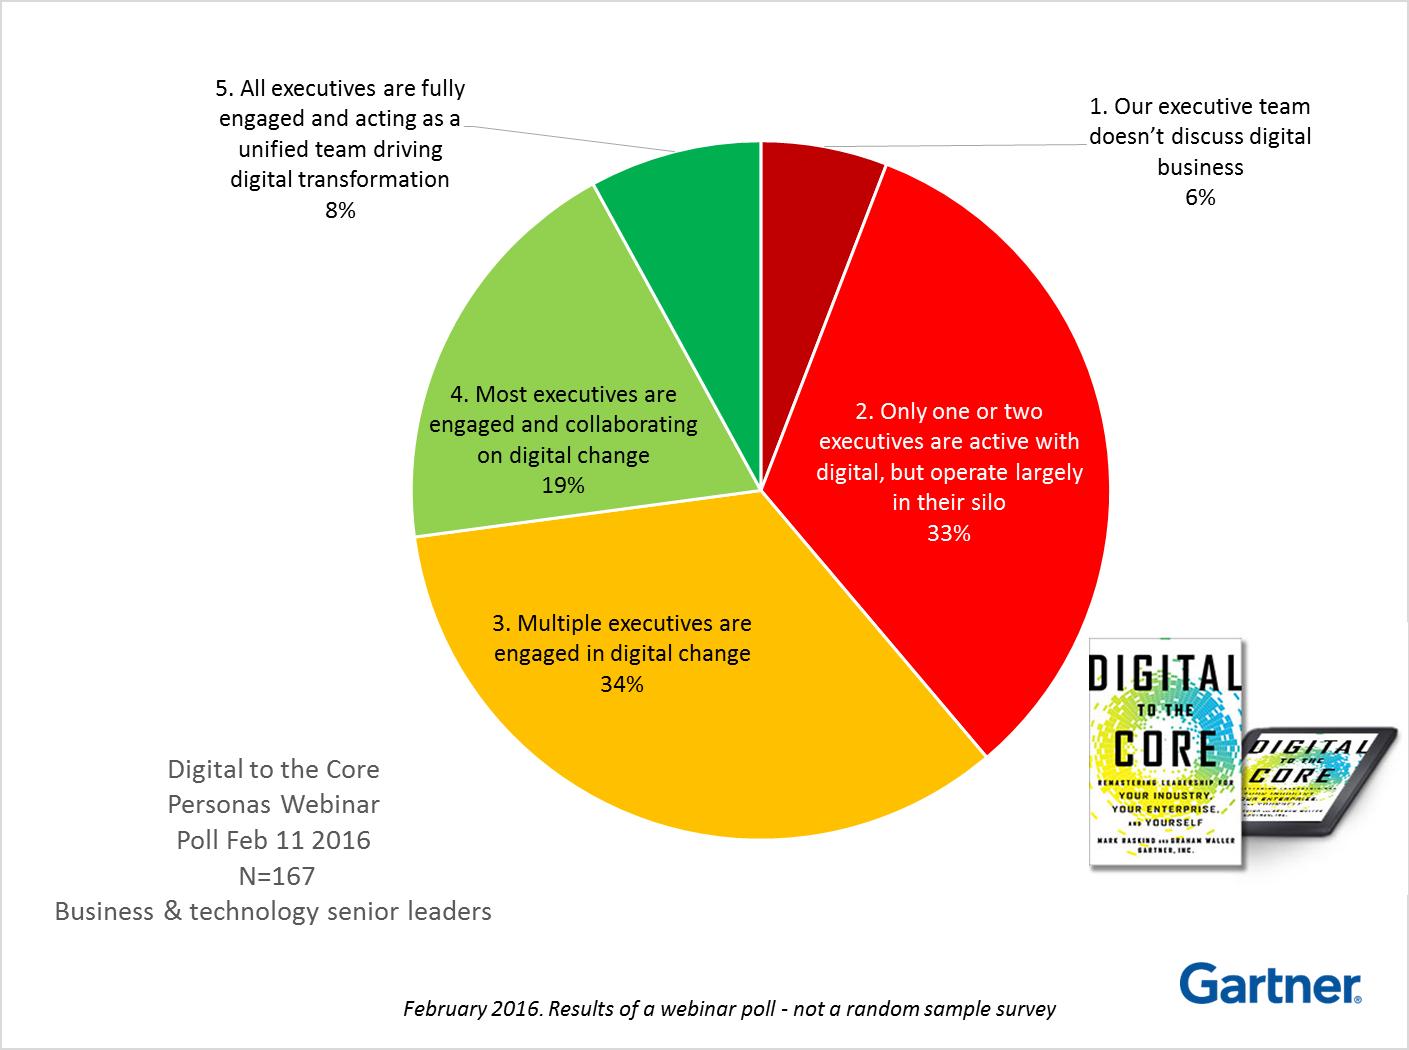 Gartner's Digital to the Core webinar poll